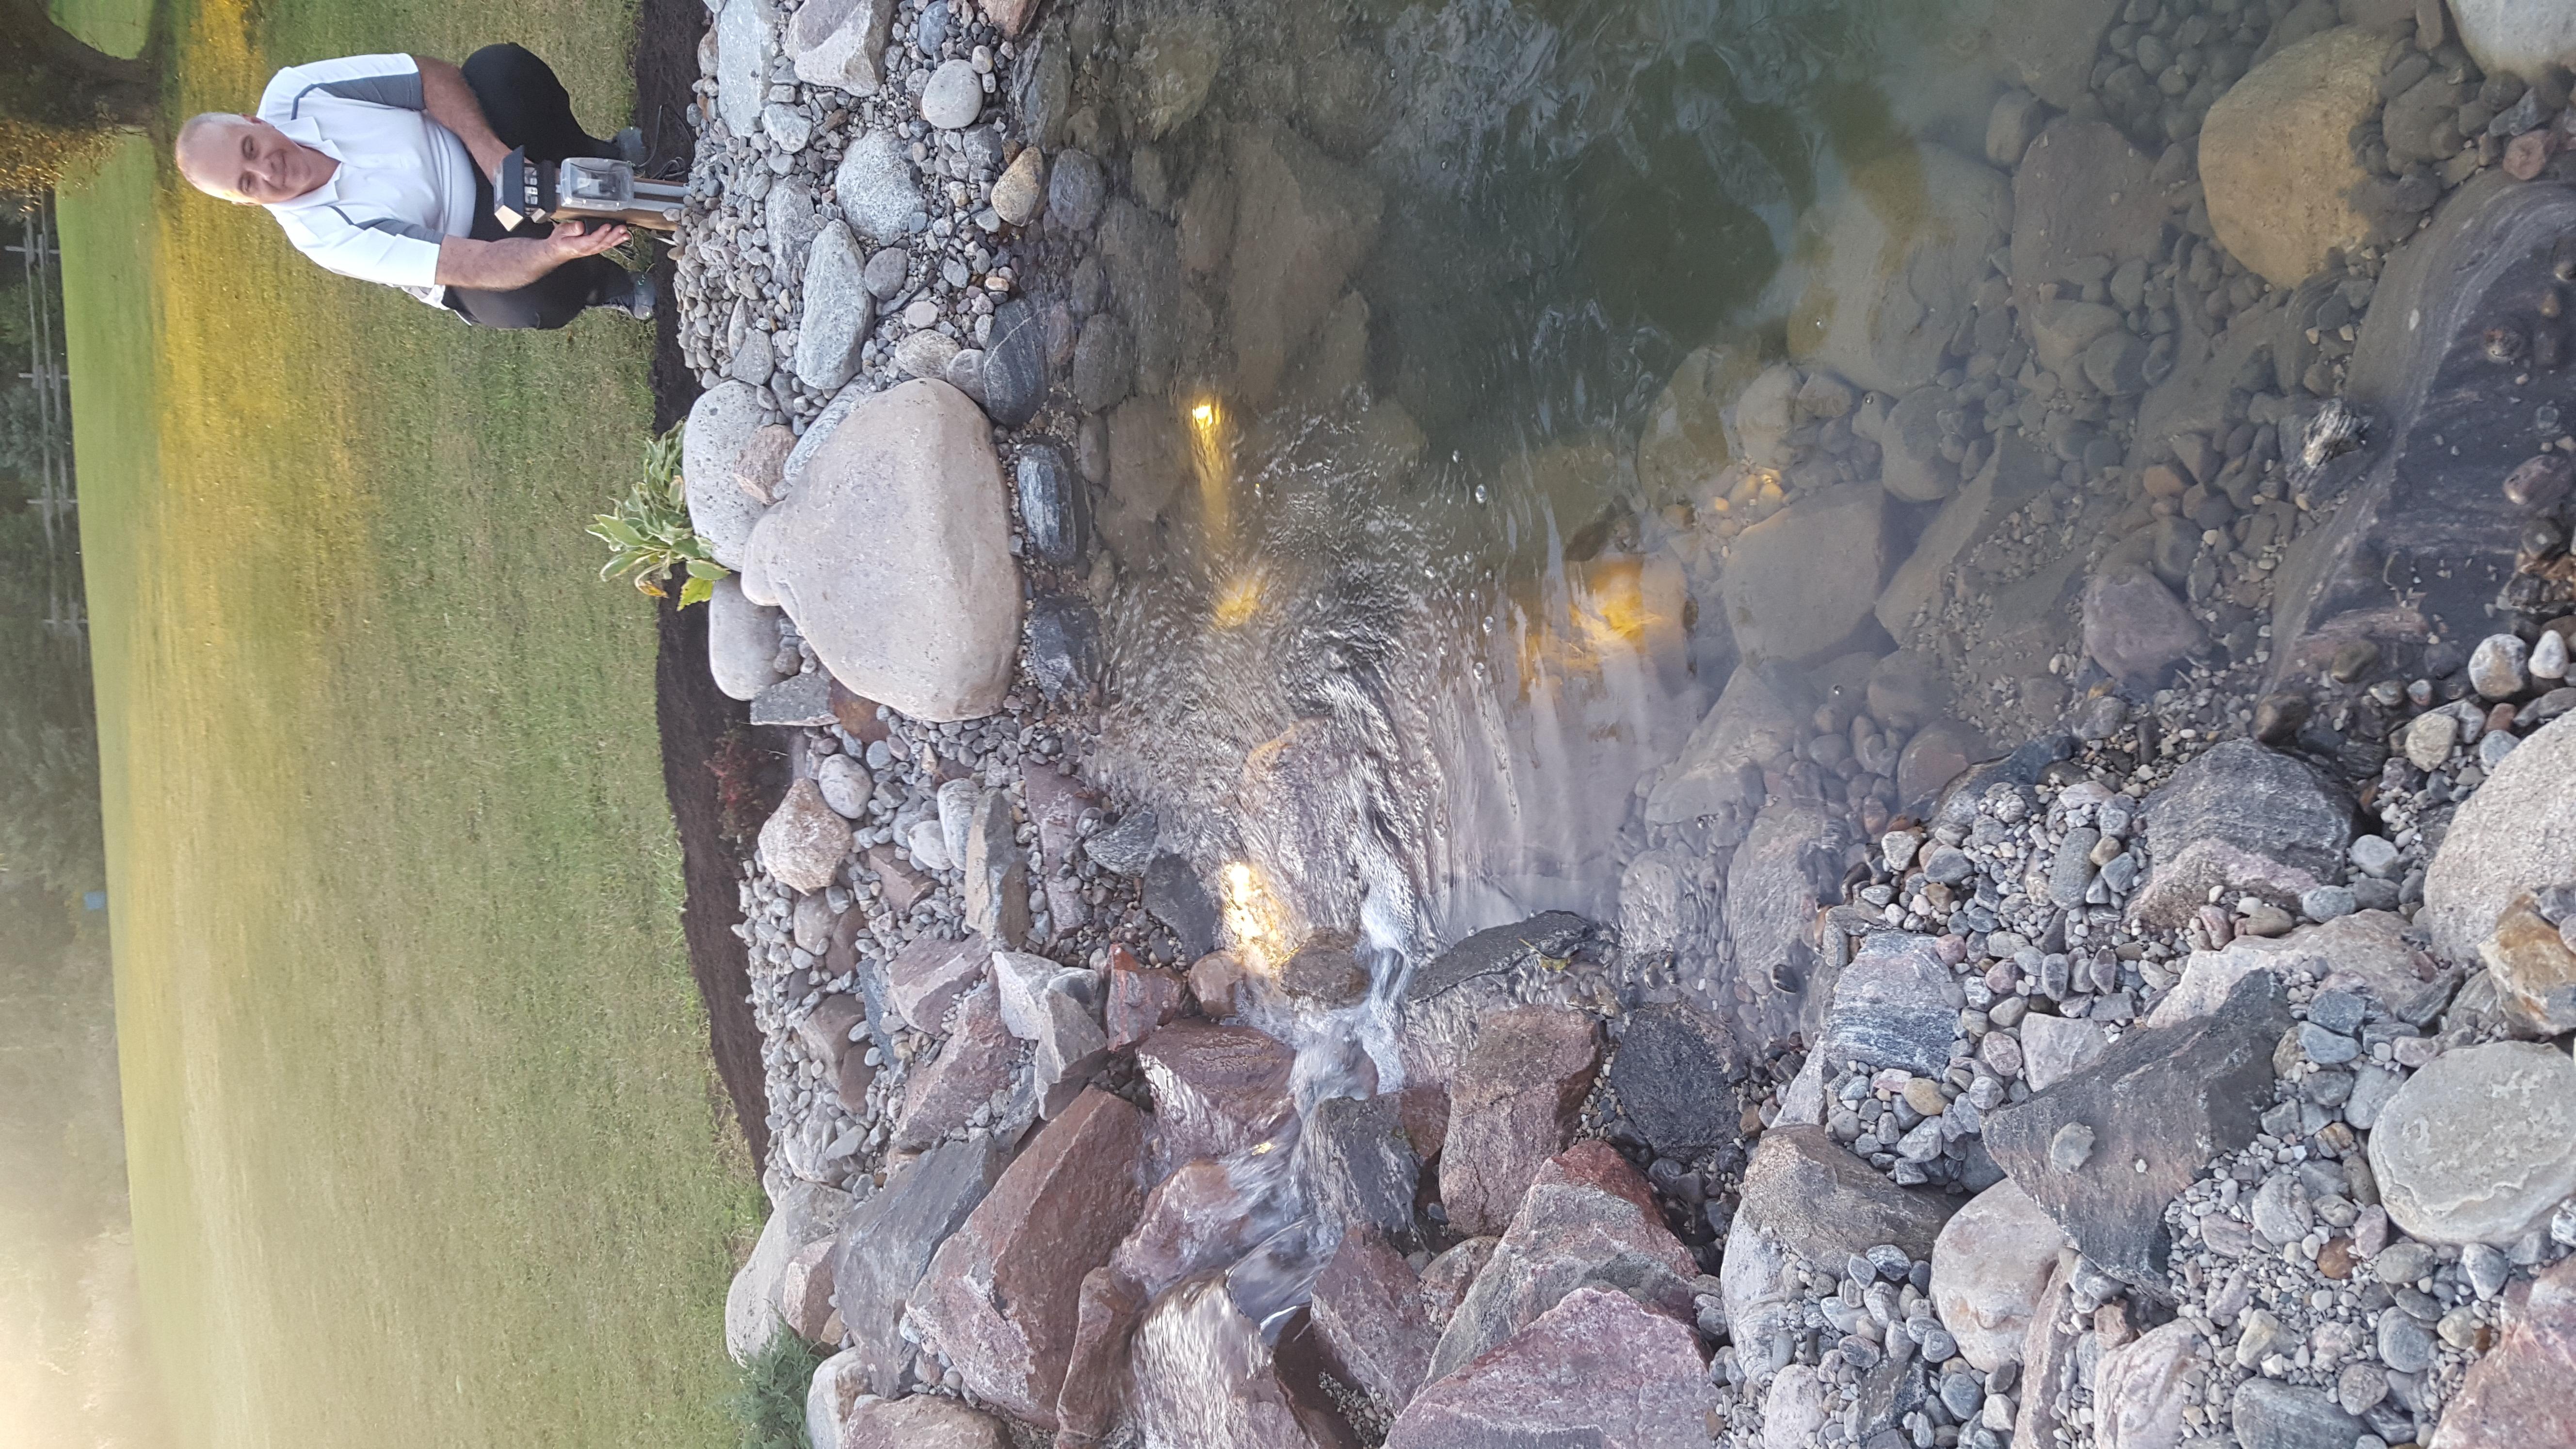 Swim Pond - Waterfall lights